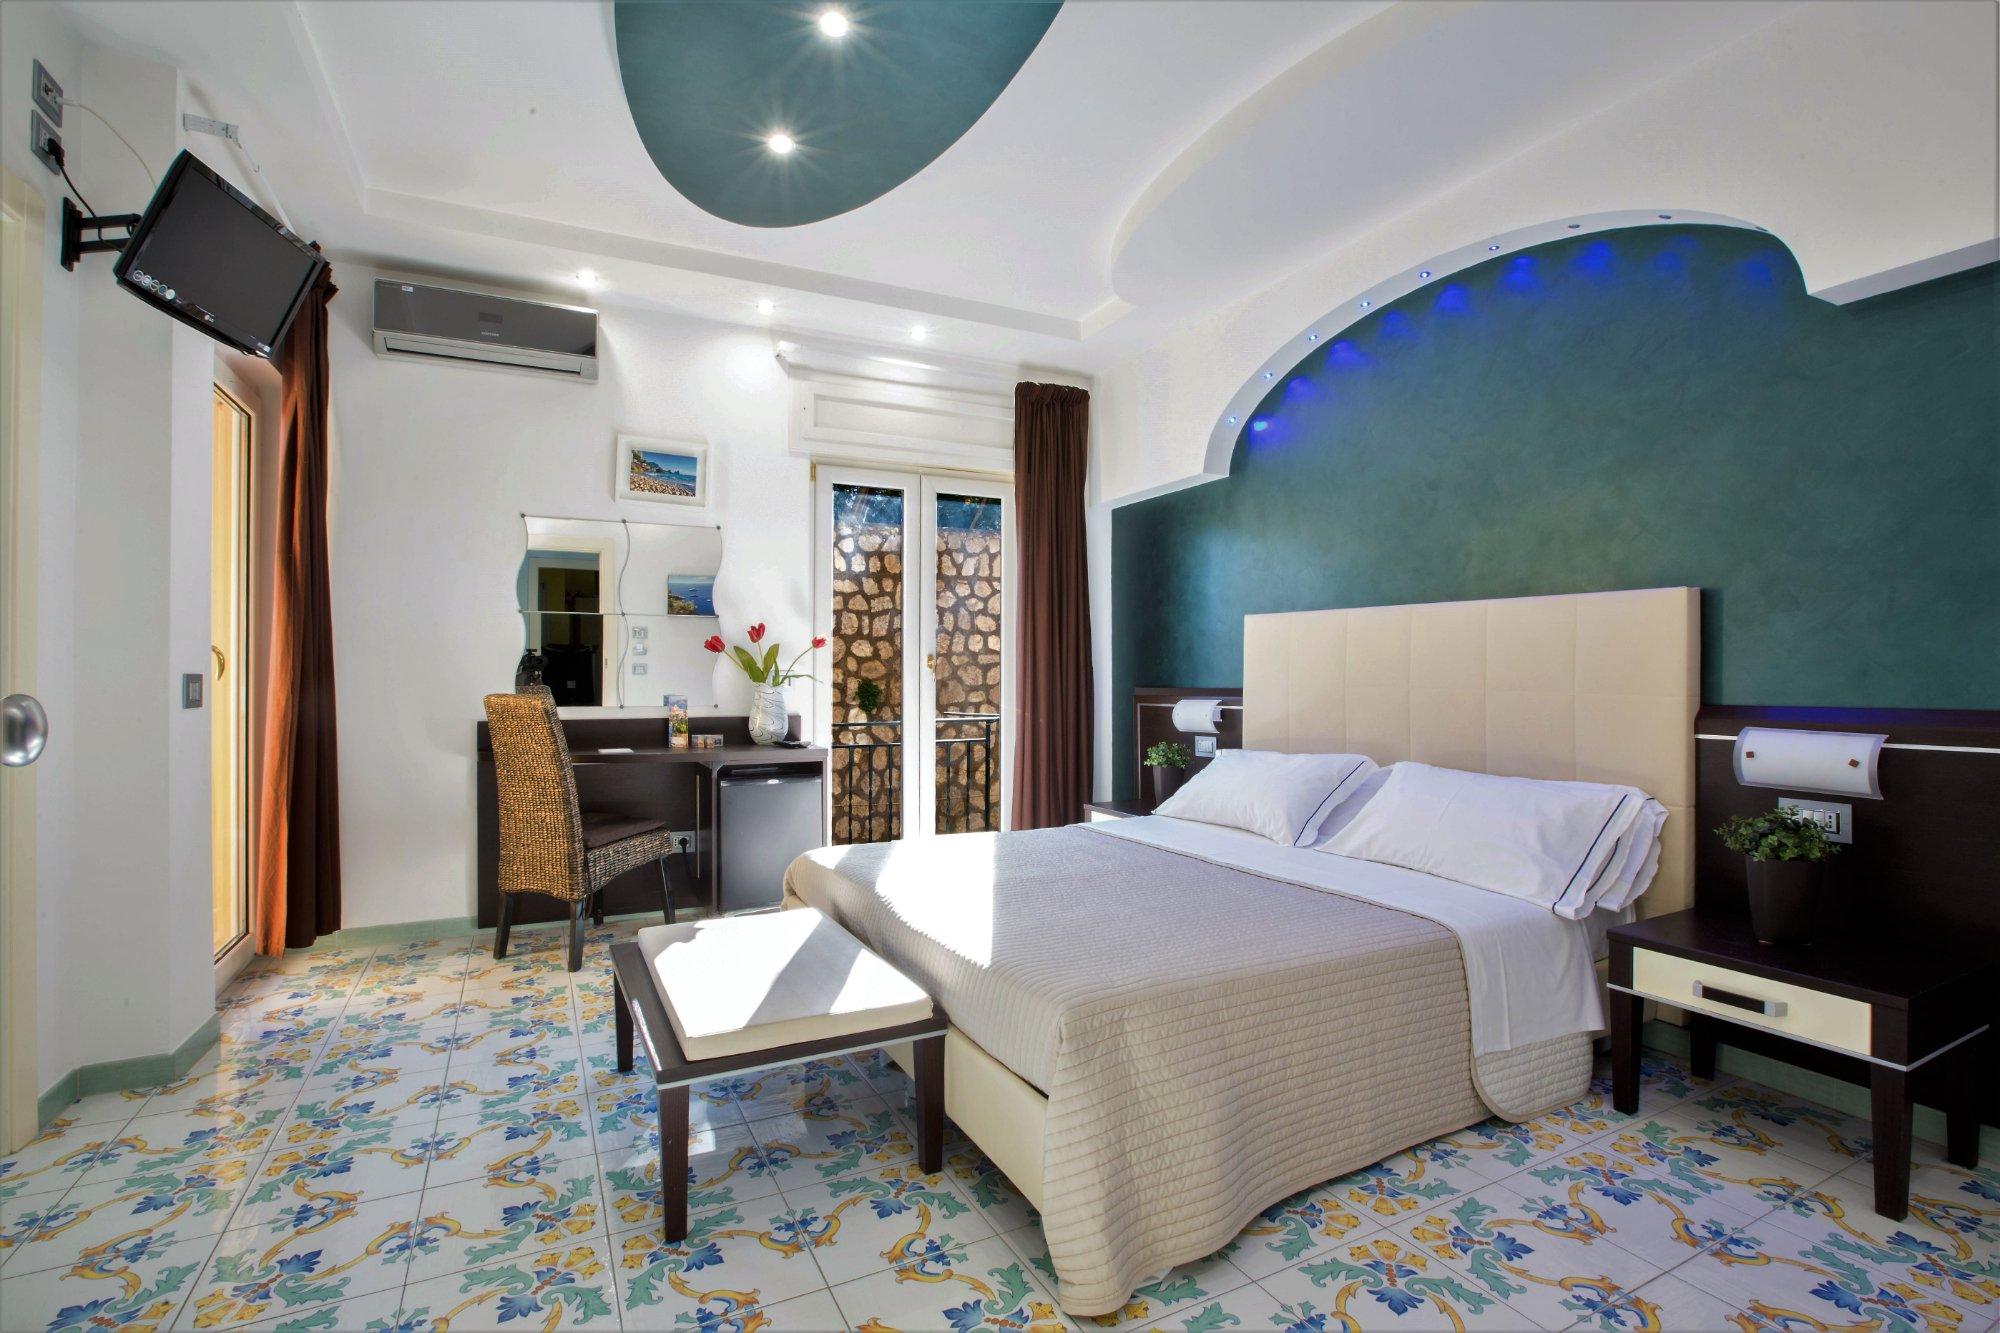 Bed and Breakfast Degli Aranci